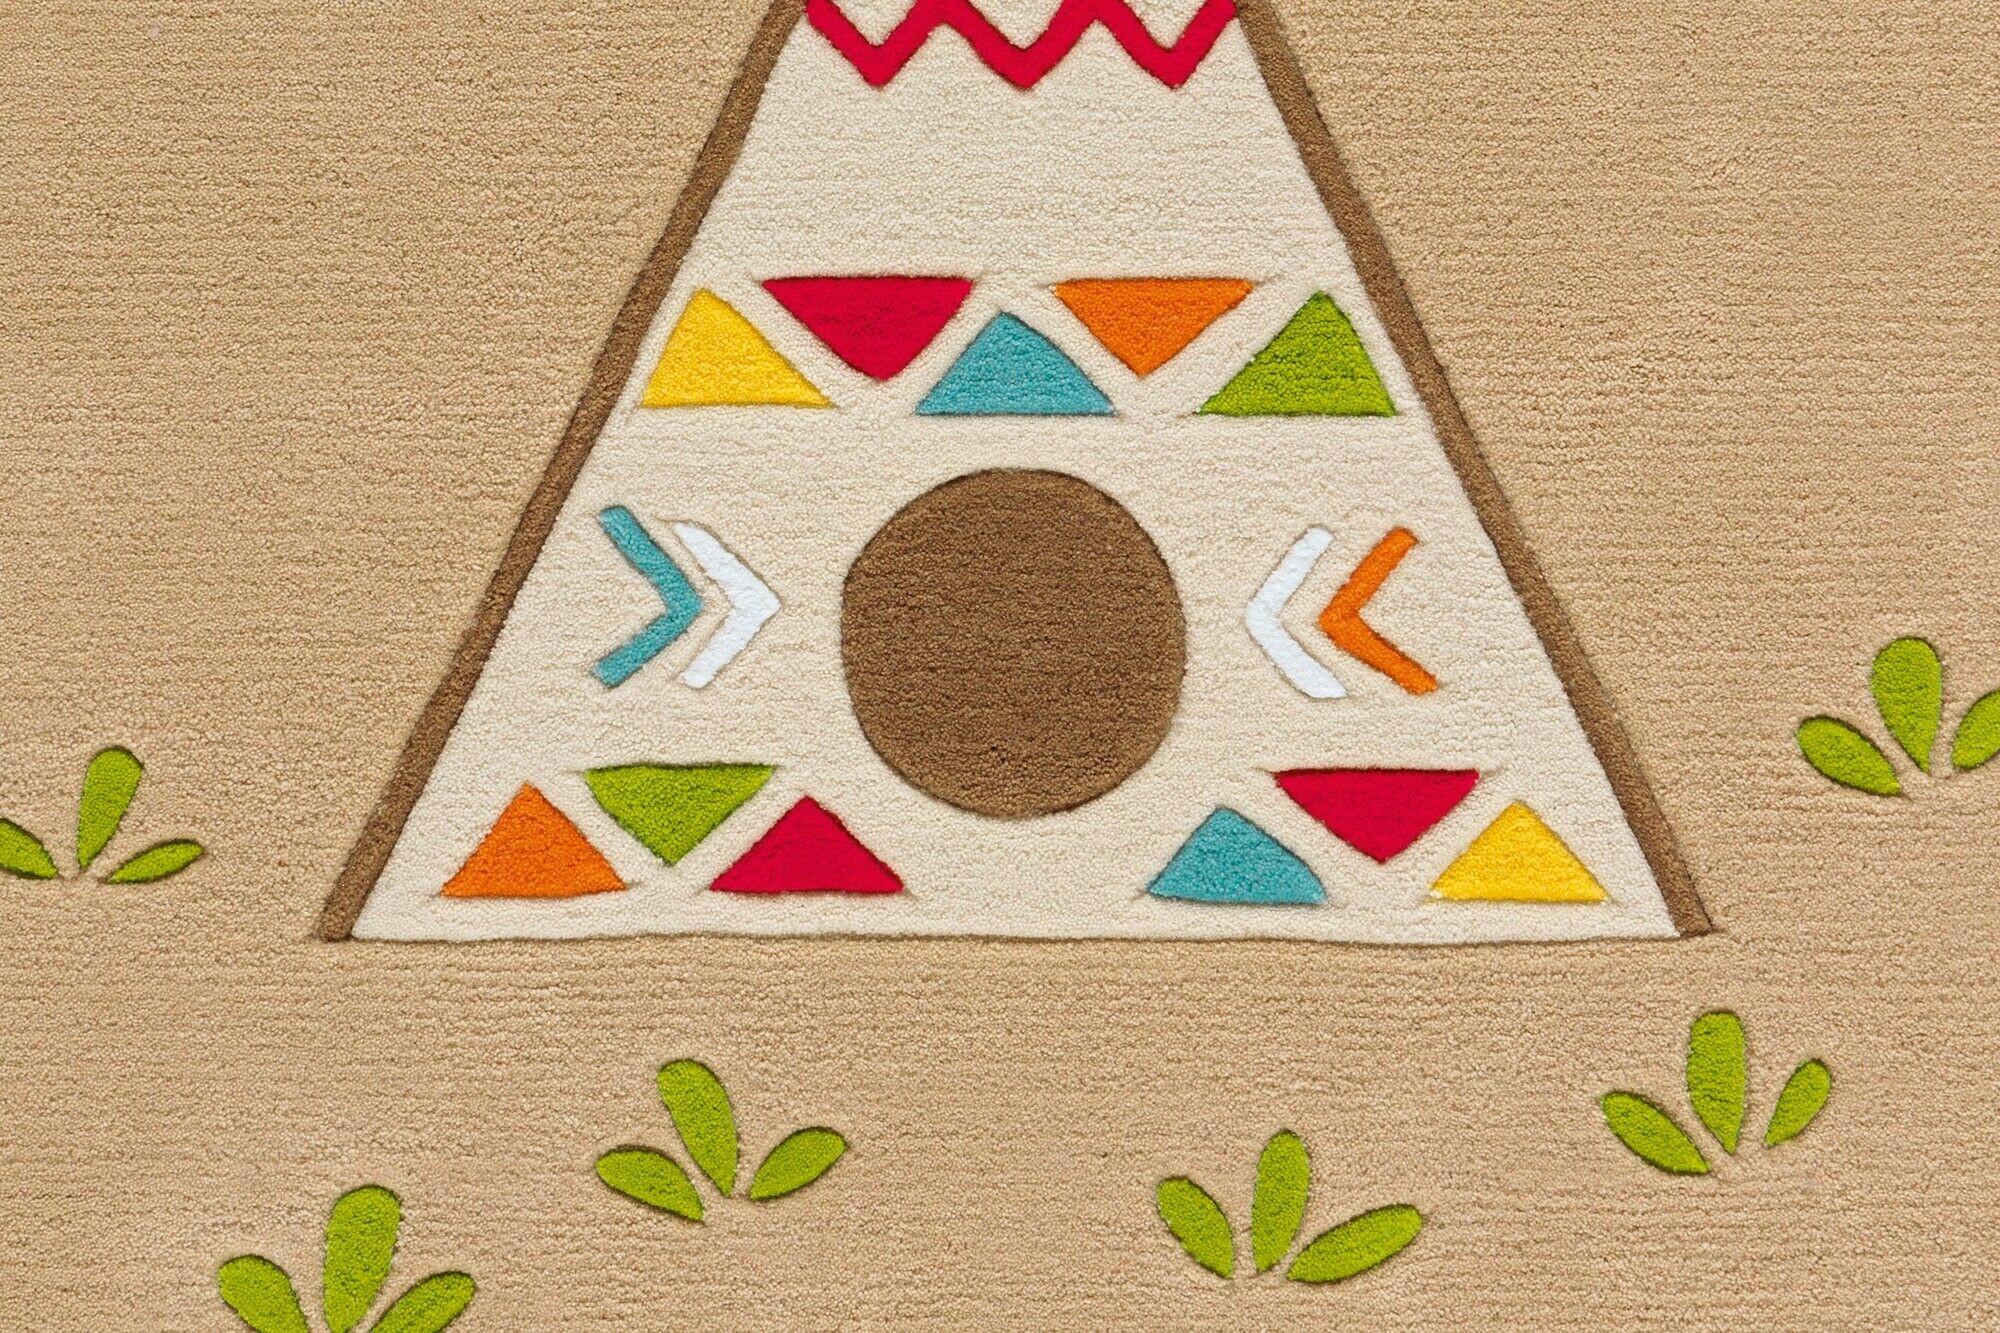 Kinder Teppich Multi Indianer Per Sempre Toys